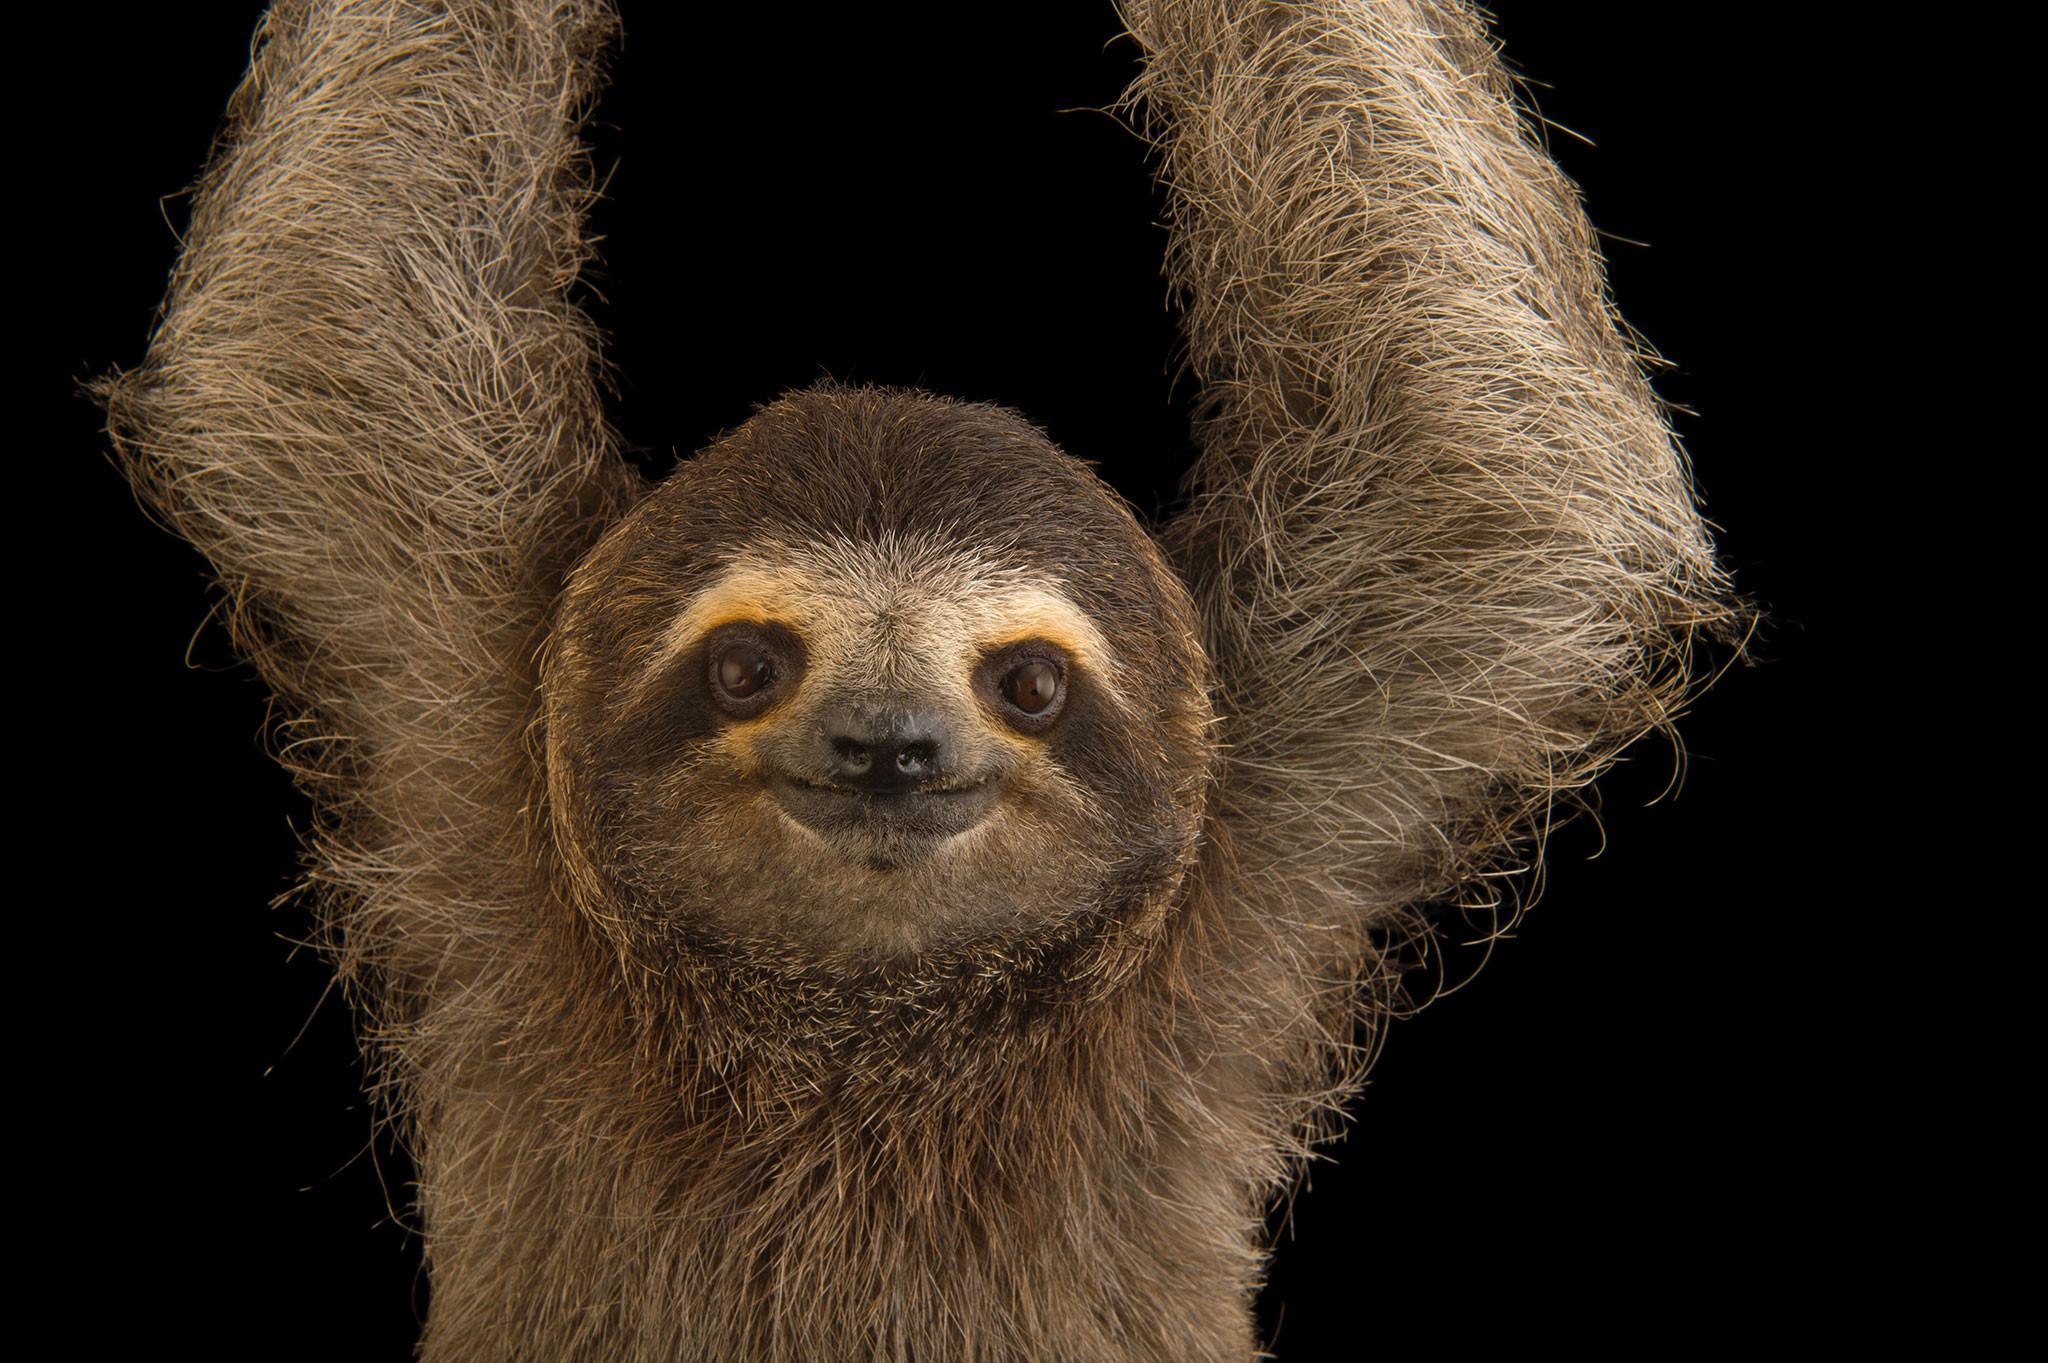 1920x1080 8 Sloth Wallpaper HD8 600x338